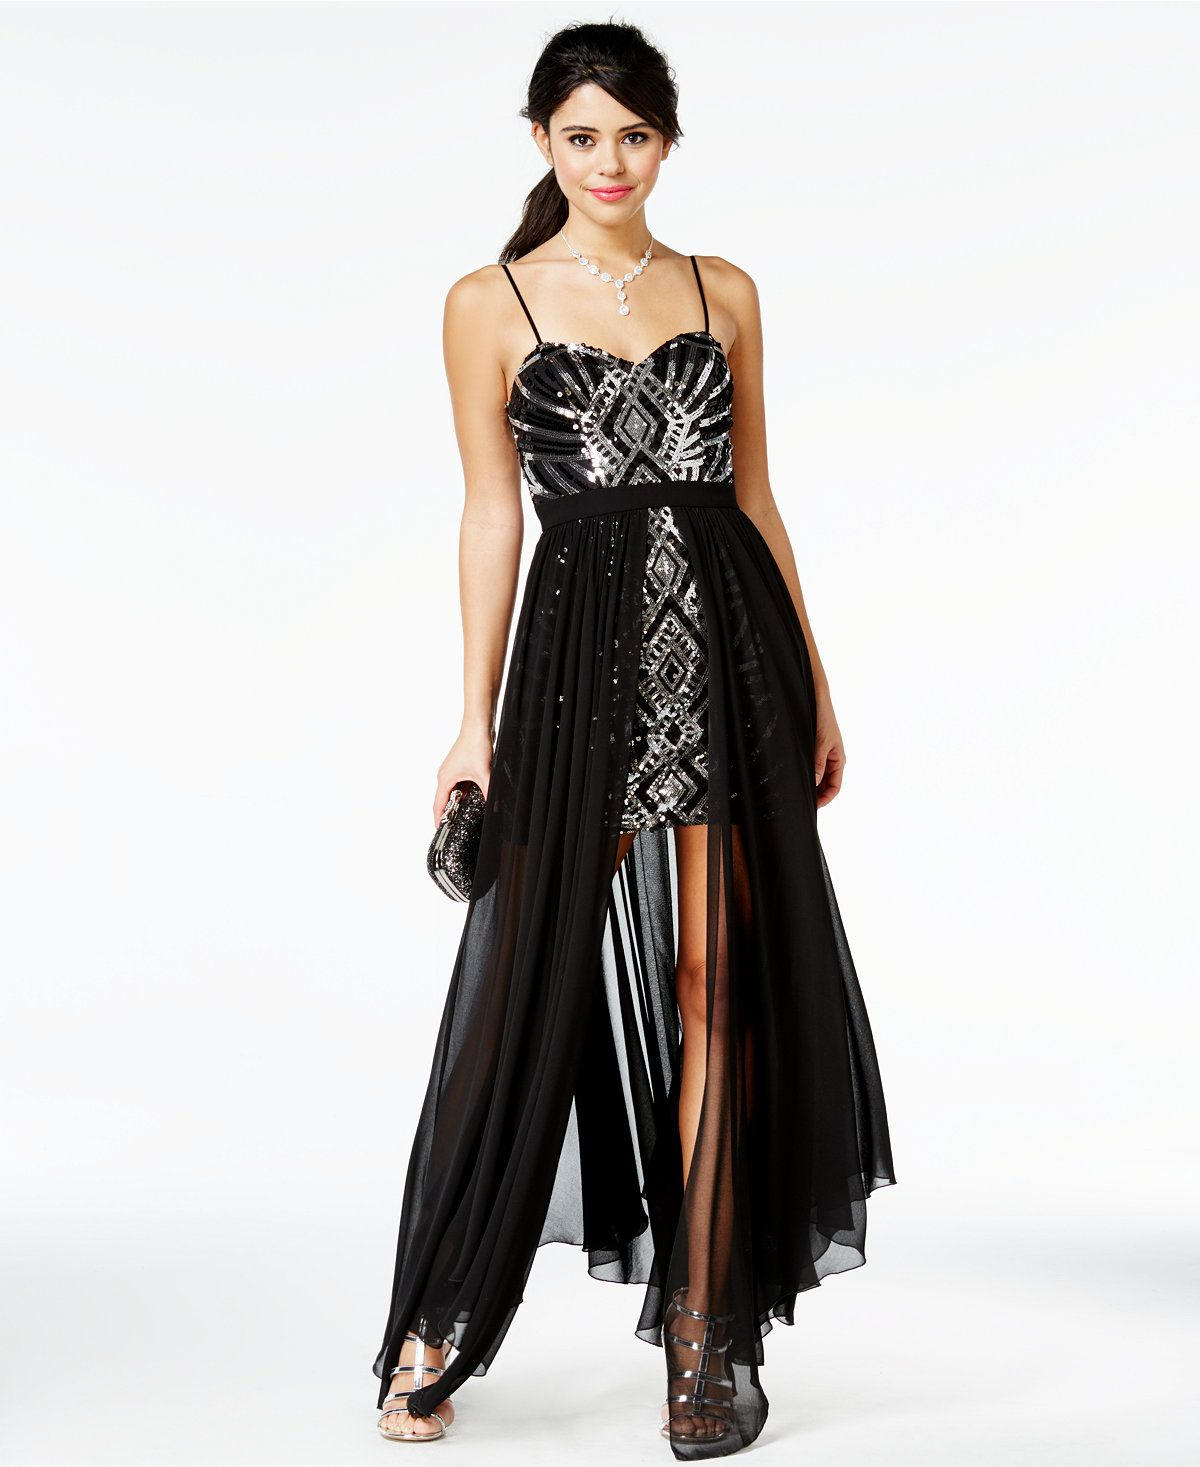 b3f50b043a0 Macys Short Black Prom Dresses - Gomes Weine AG